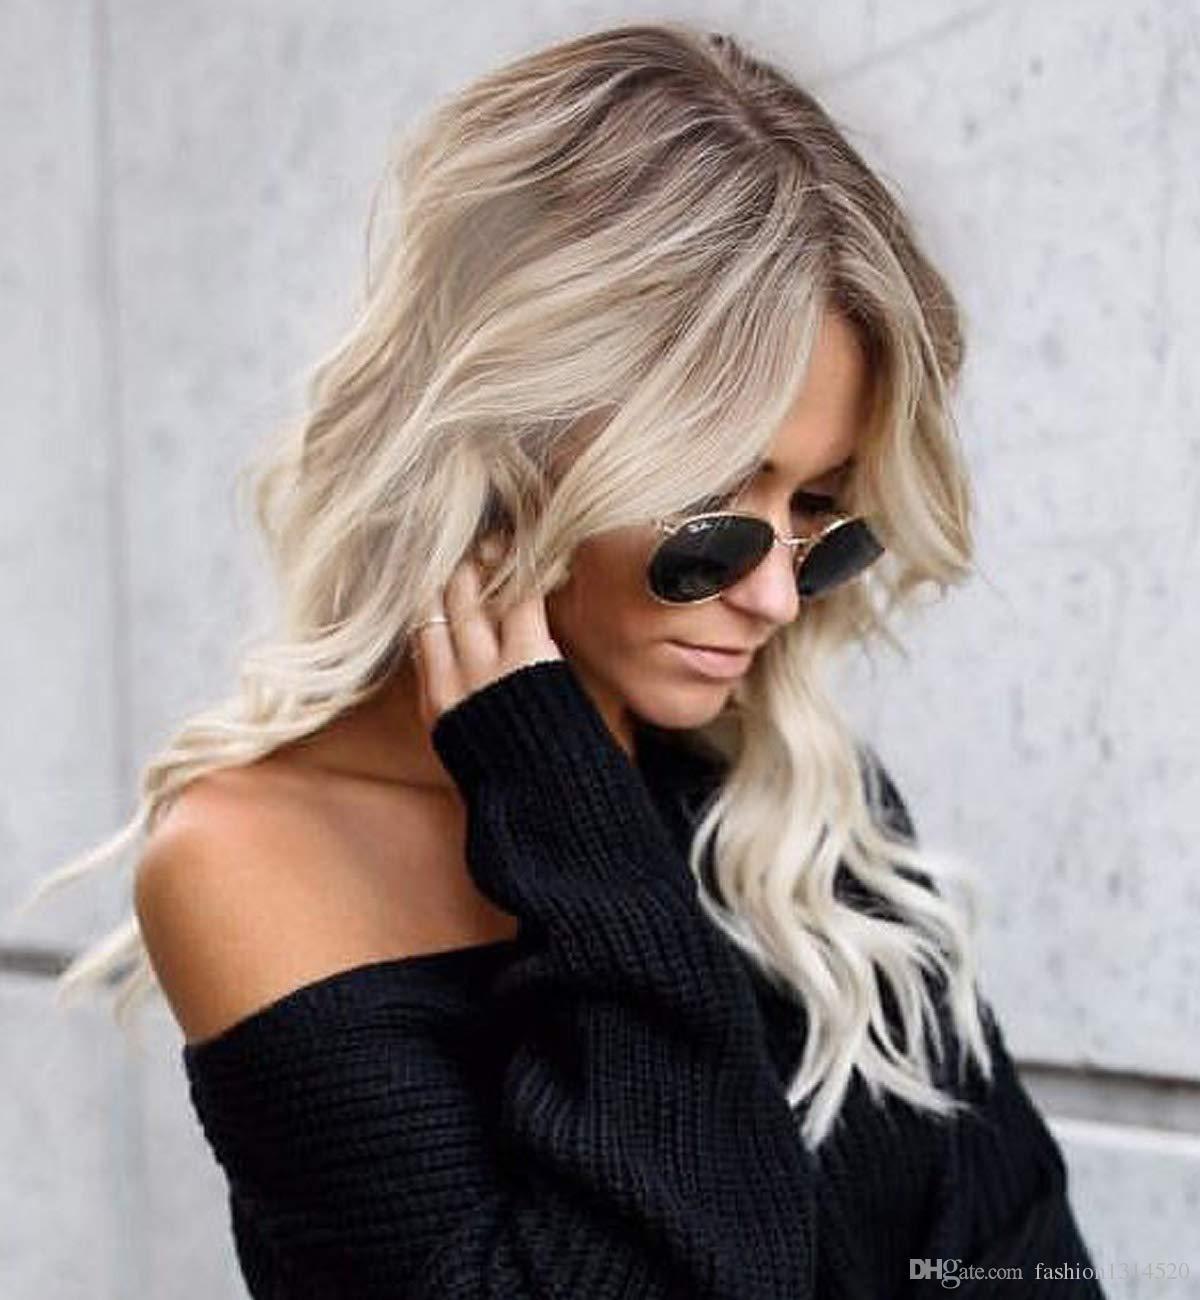 Haarfarbe Braun Blond Balayage Balayage Braun Grau 2019